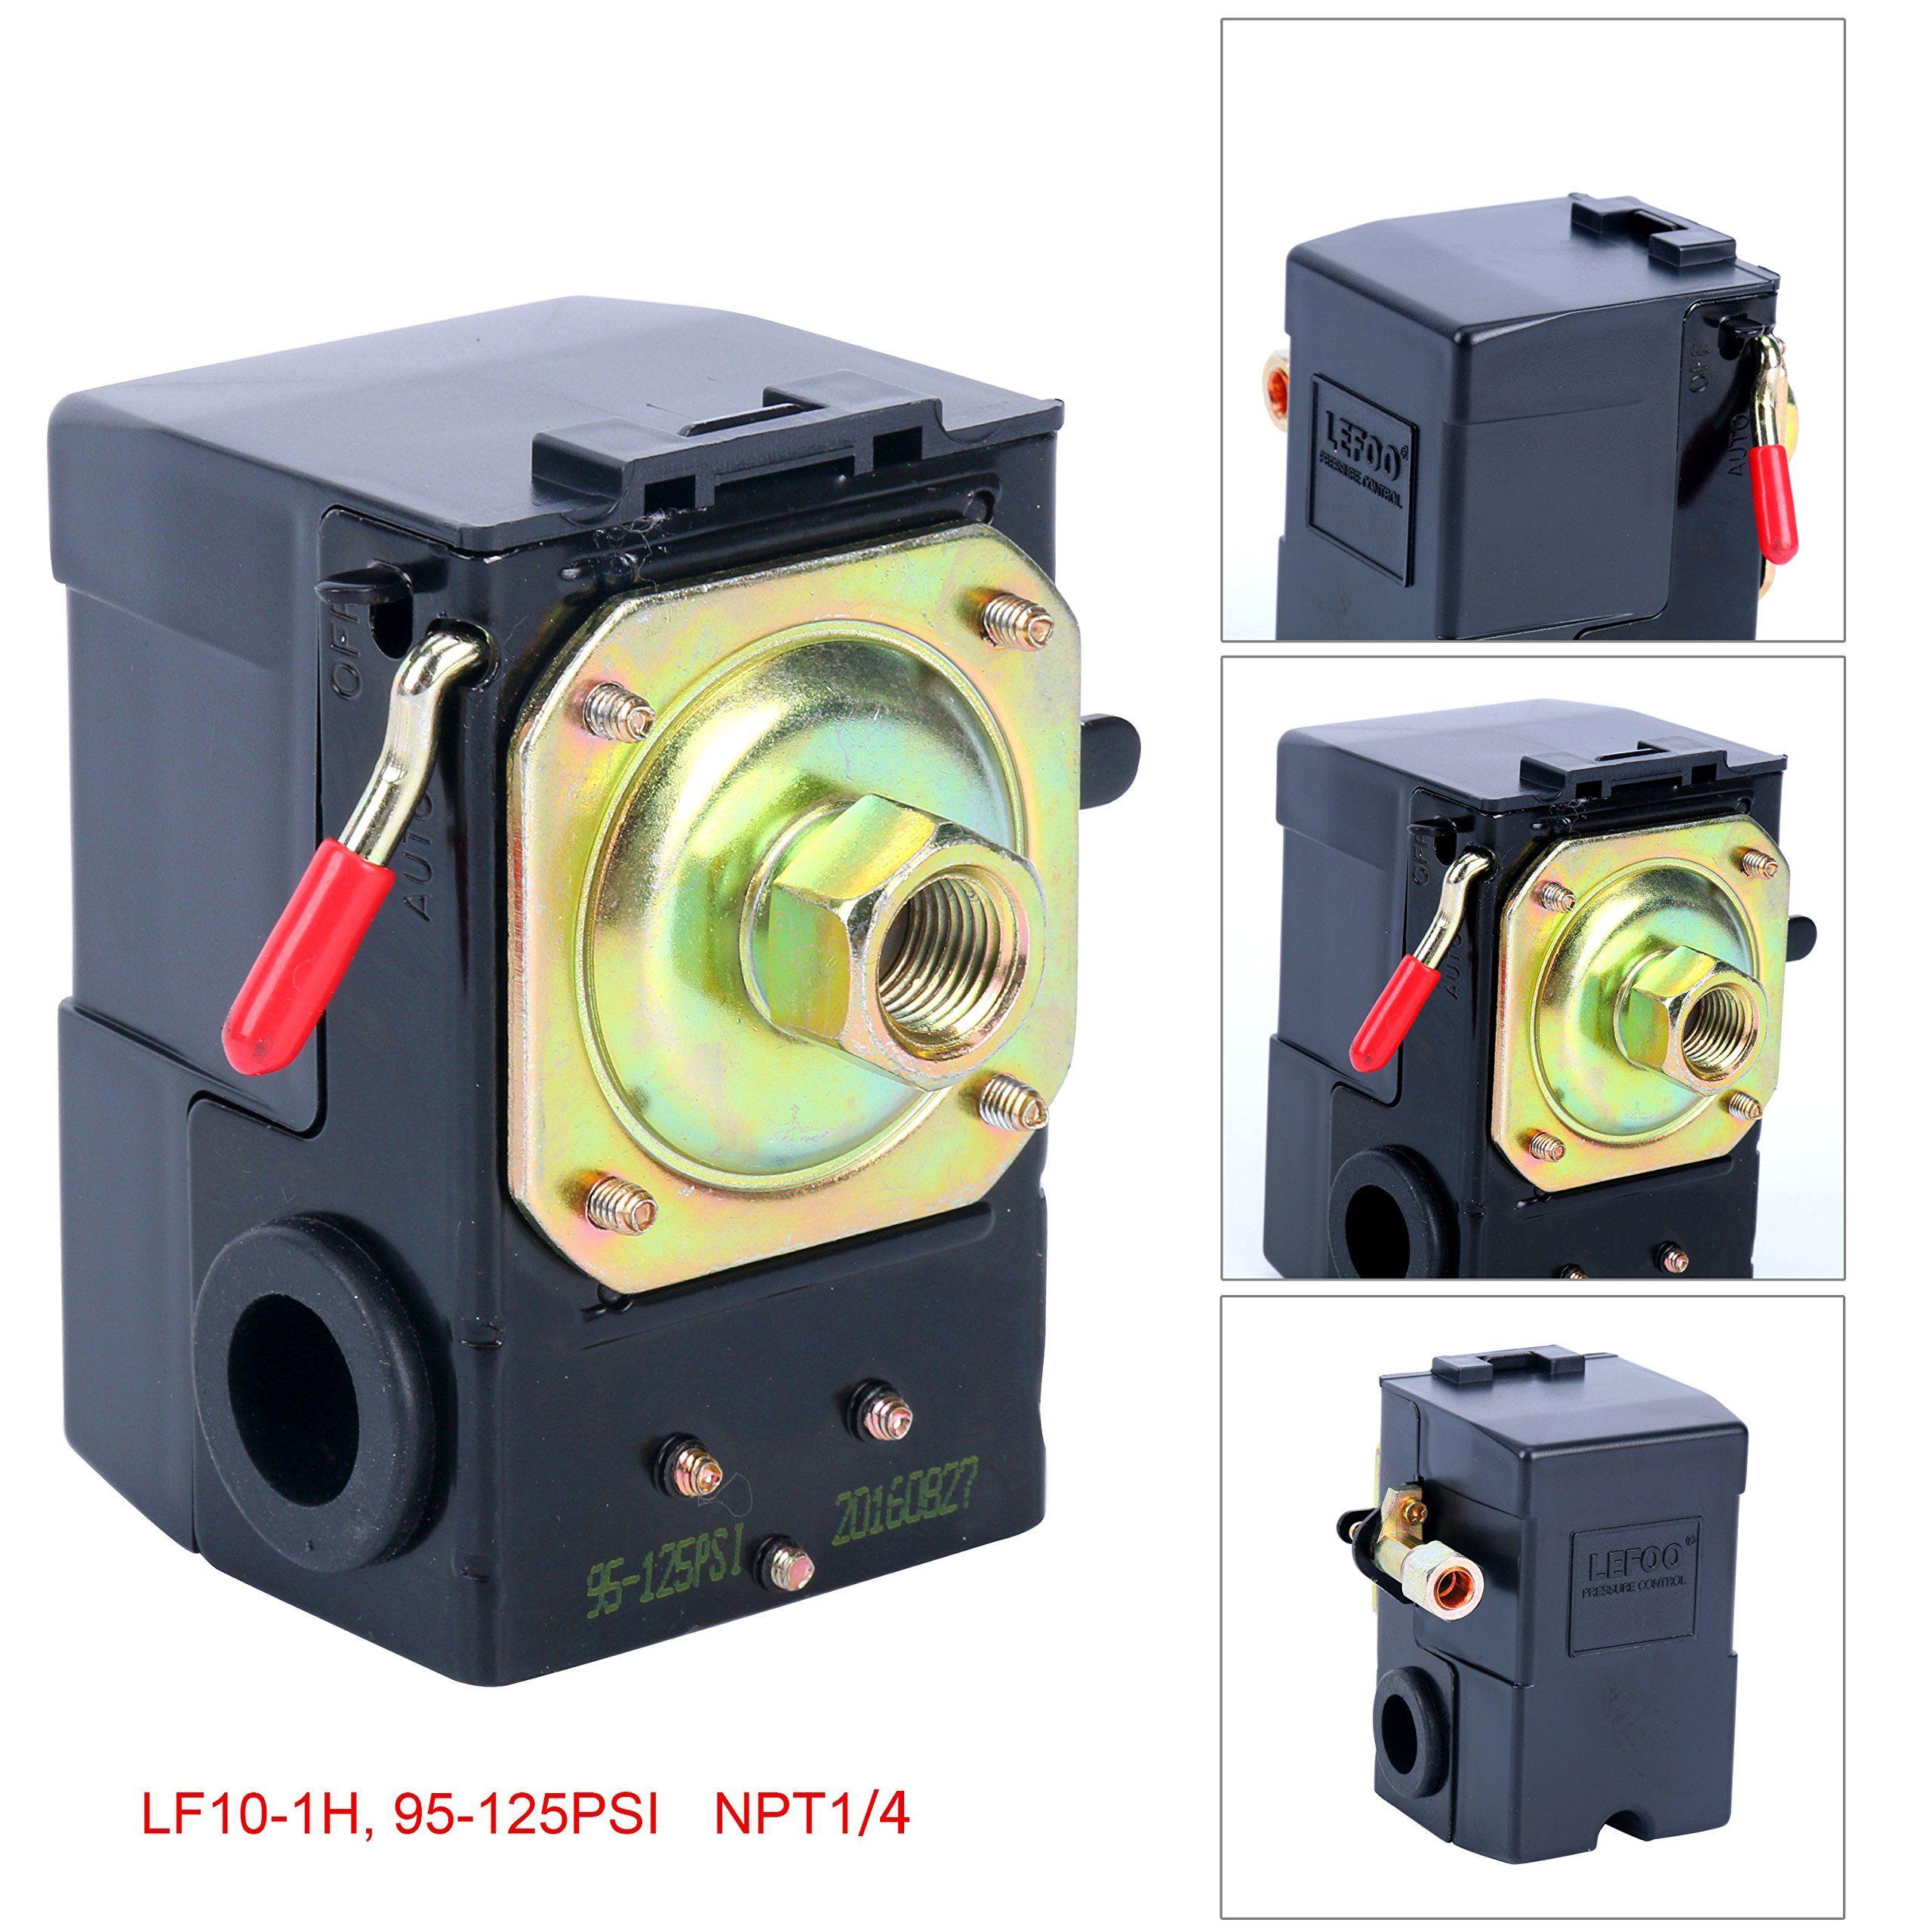 lefoo LF101H1NPT1/495125 Pressure Switch ** Want